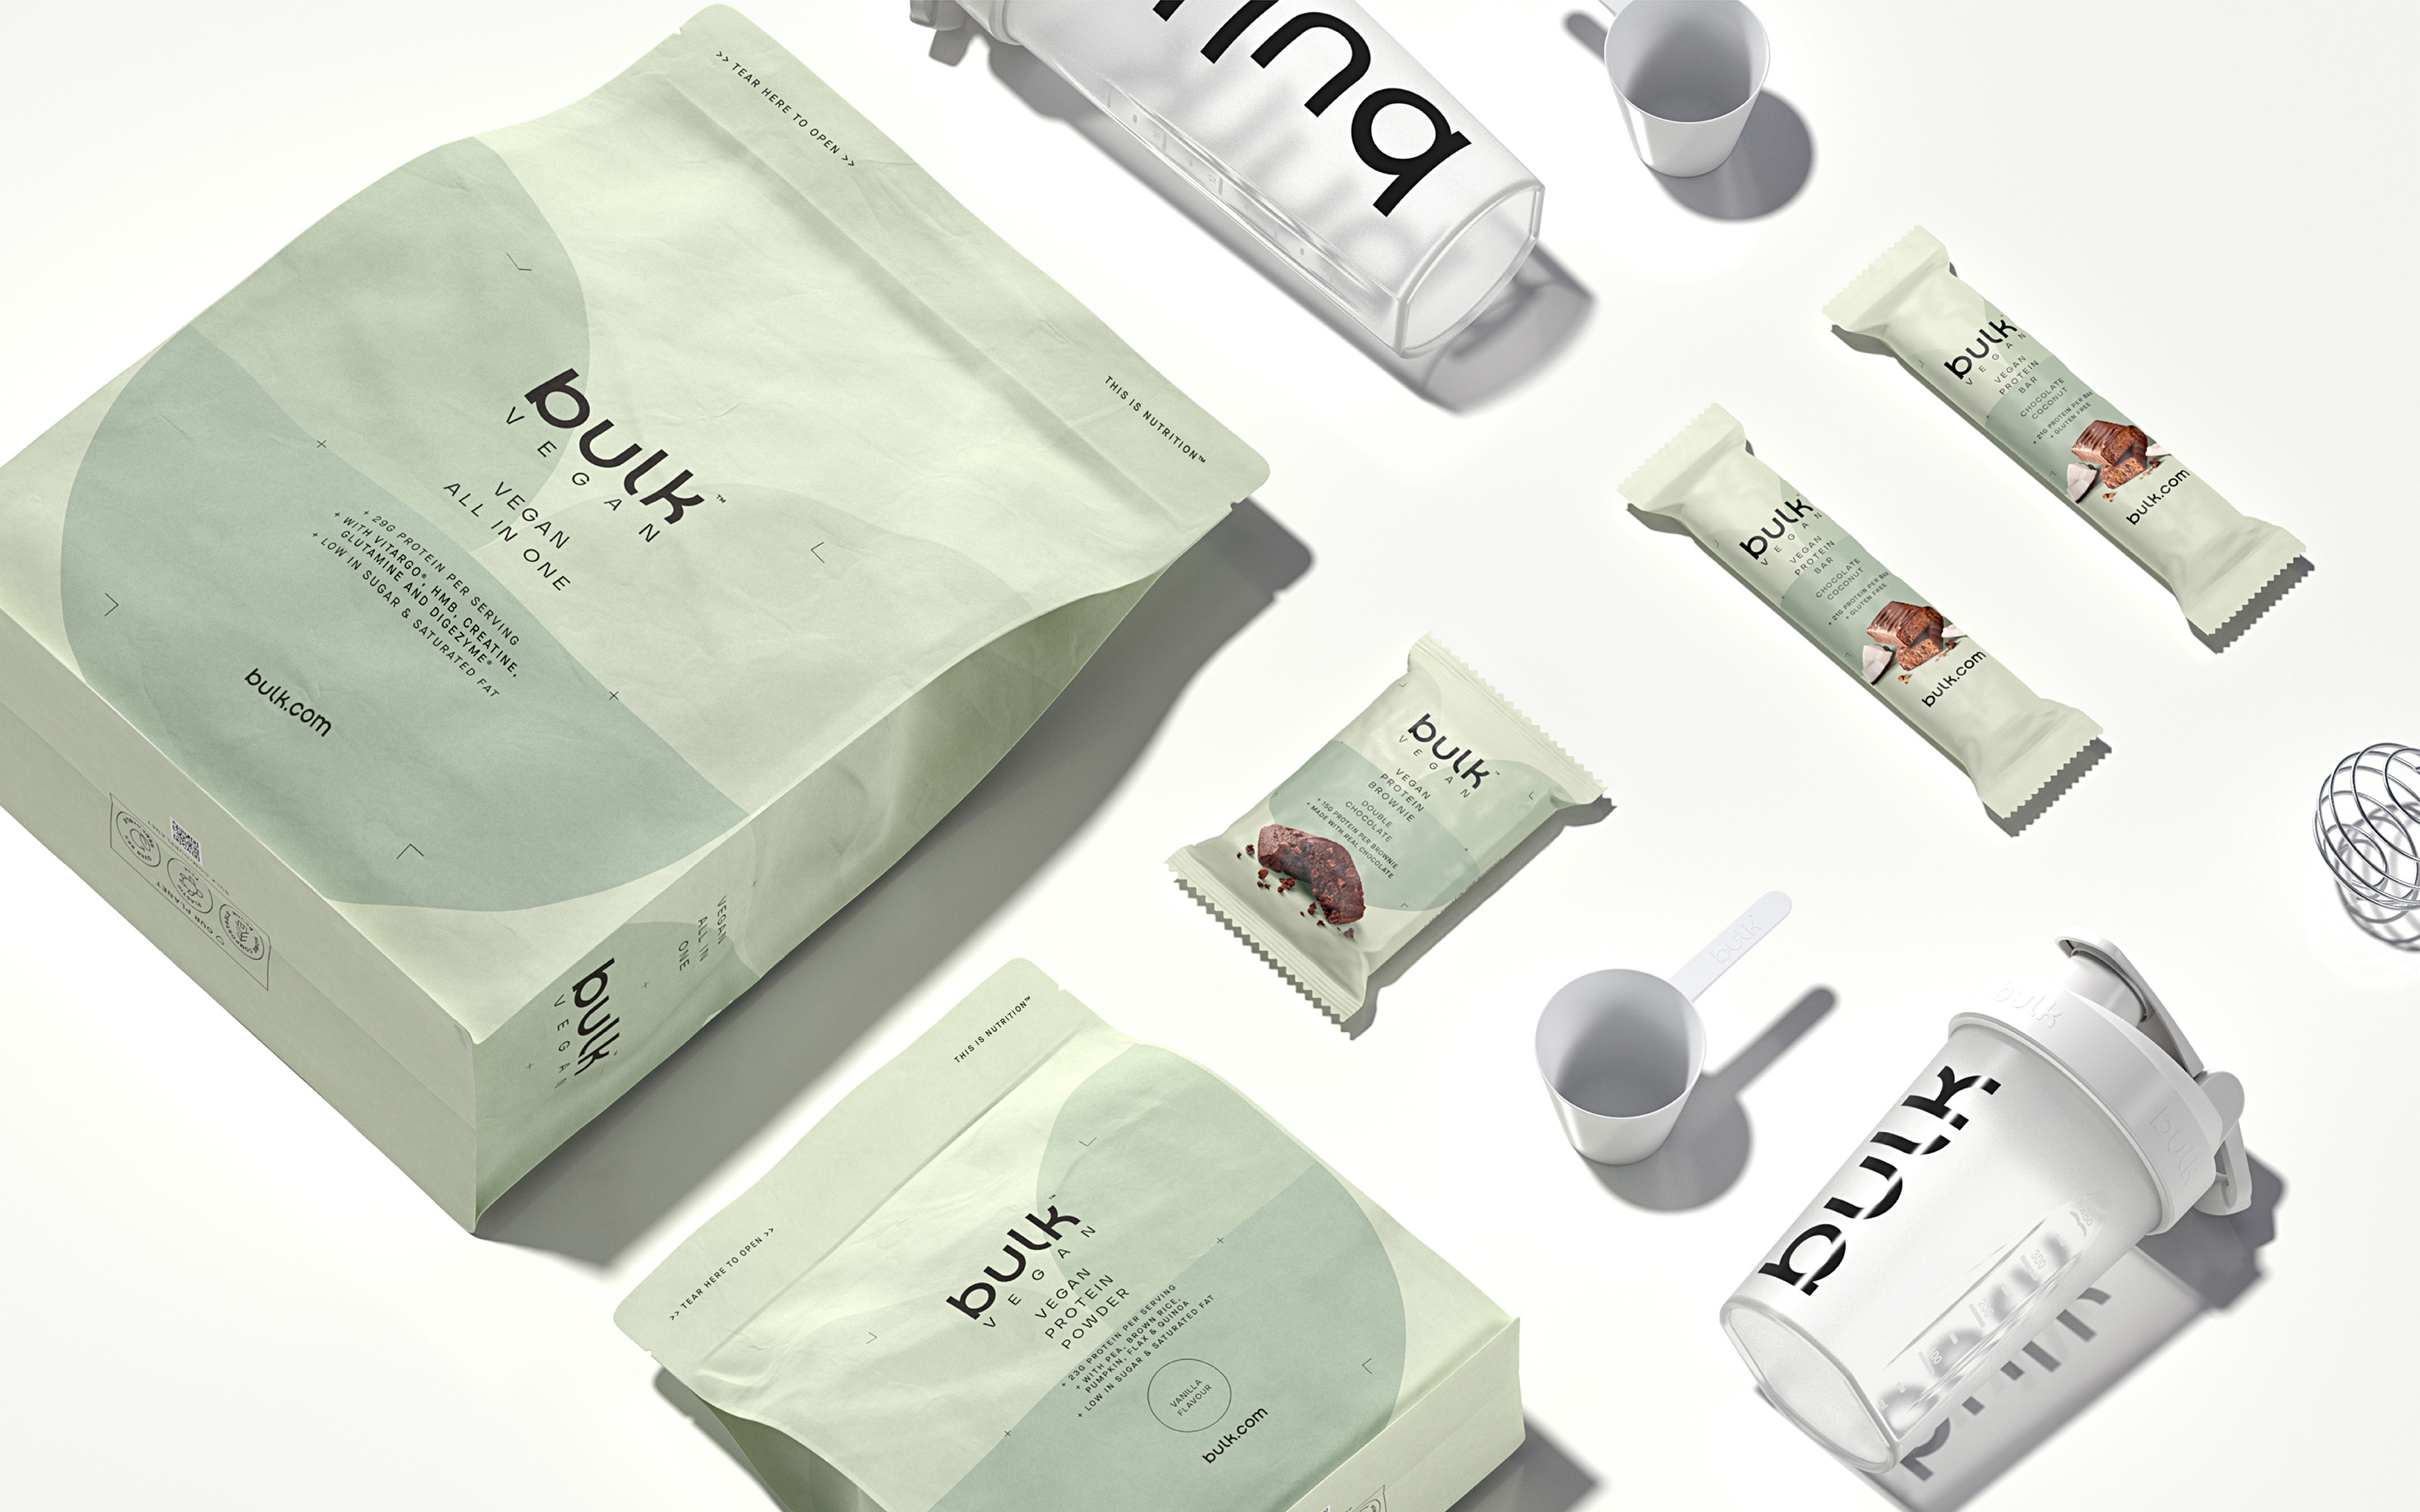 Robot Food Reposition Bulk as an Aspirational Active Nutrition Brand